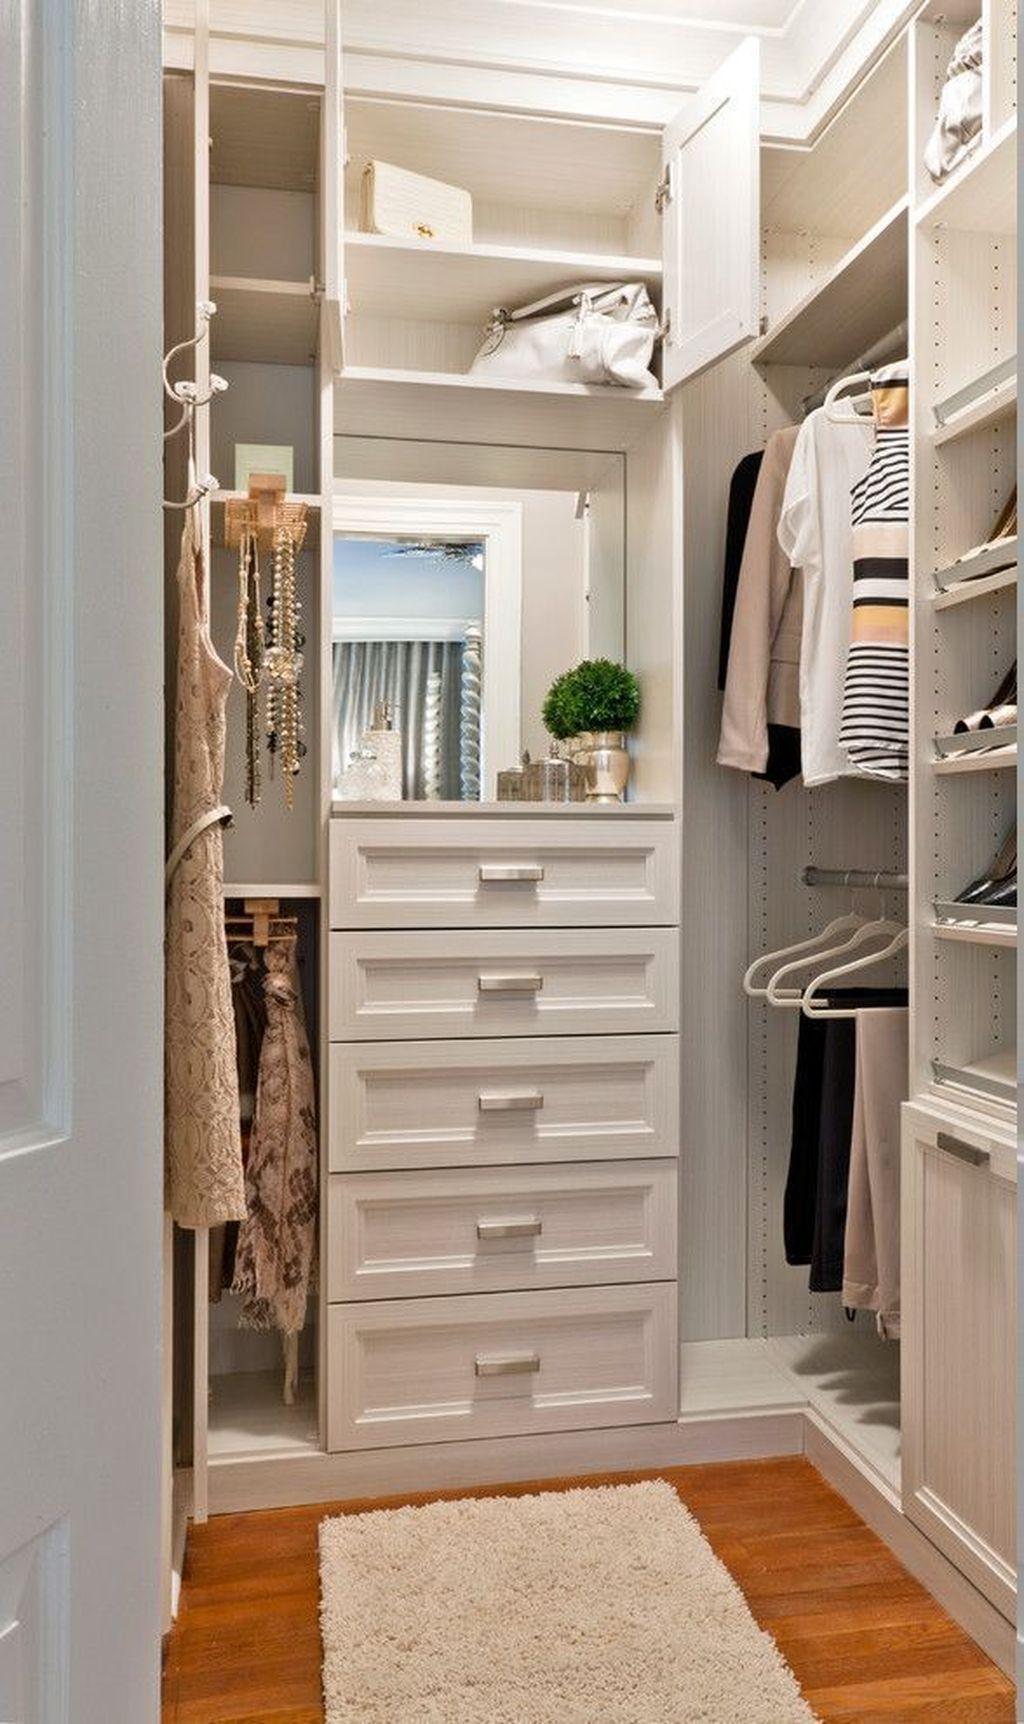 Rustic Wardrobe Design Ideas That Is In Trend 44